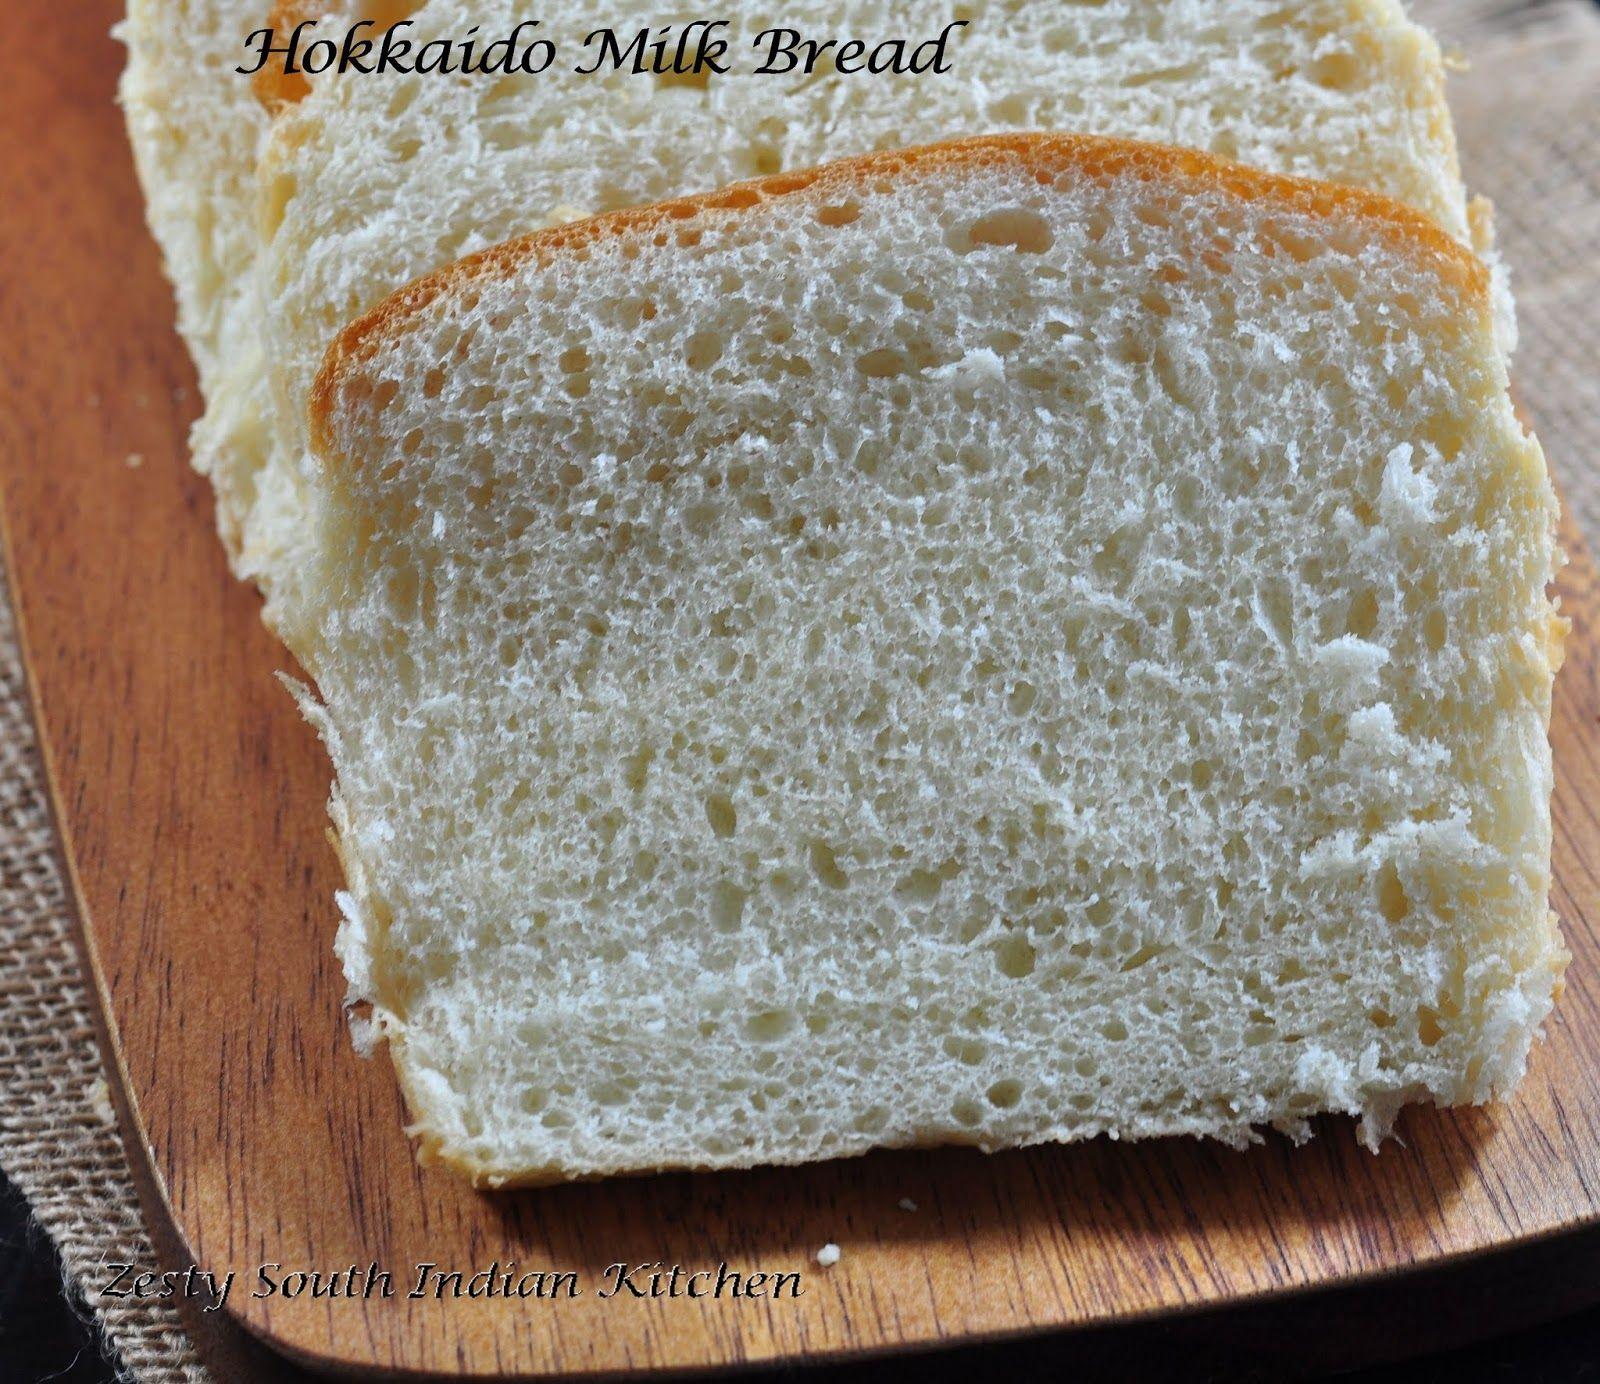 Hokkaido Milk Bread - Zesty South Indian Kitchen  Hokkaido milk